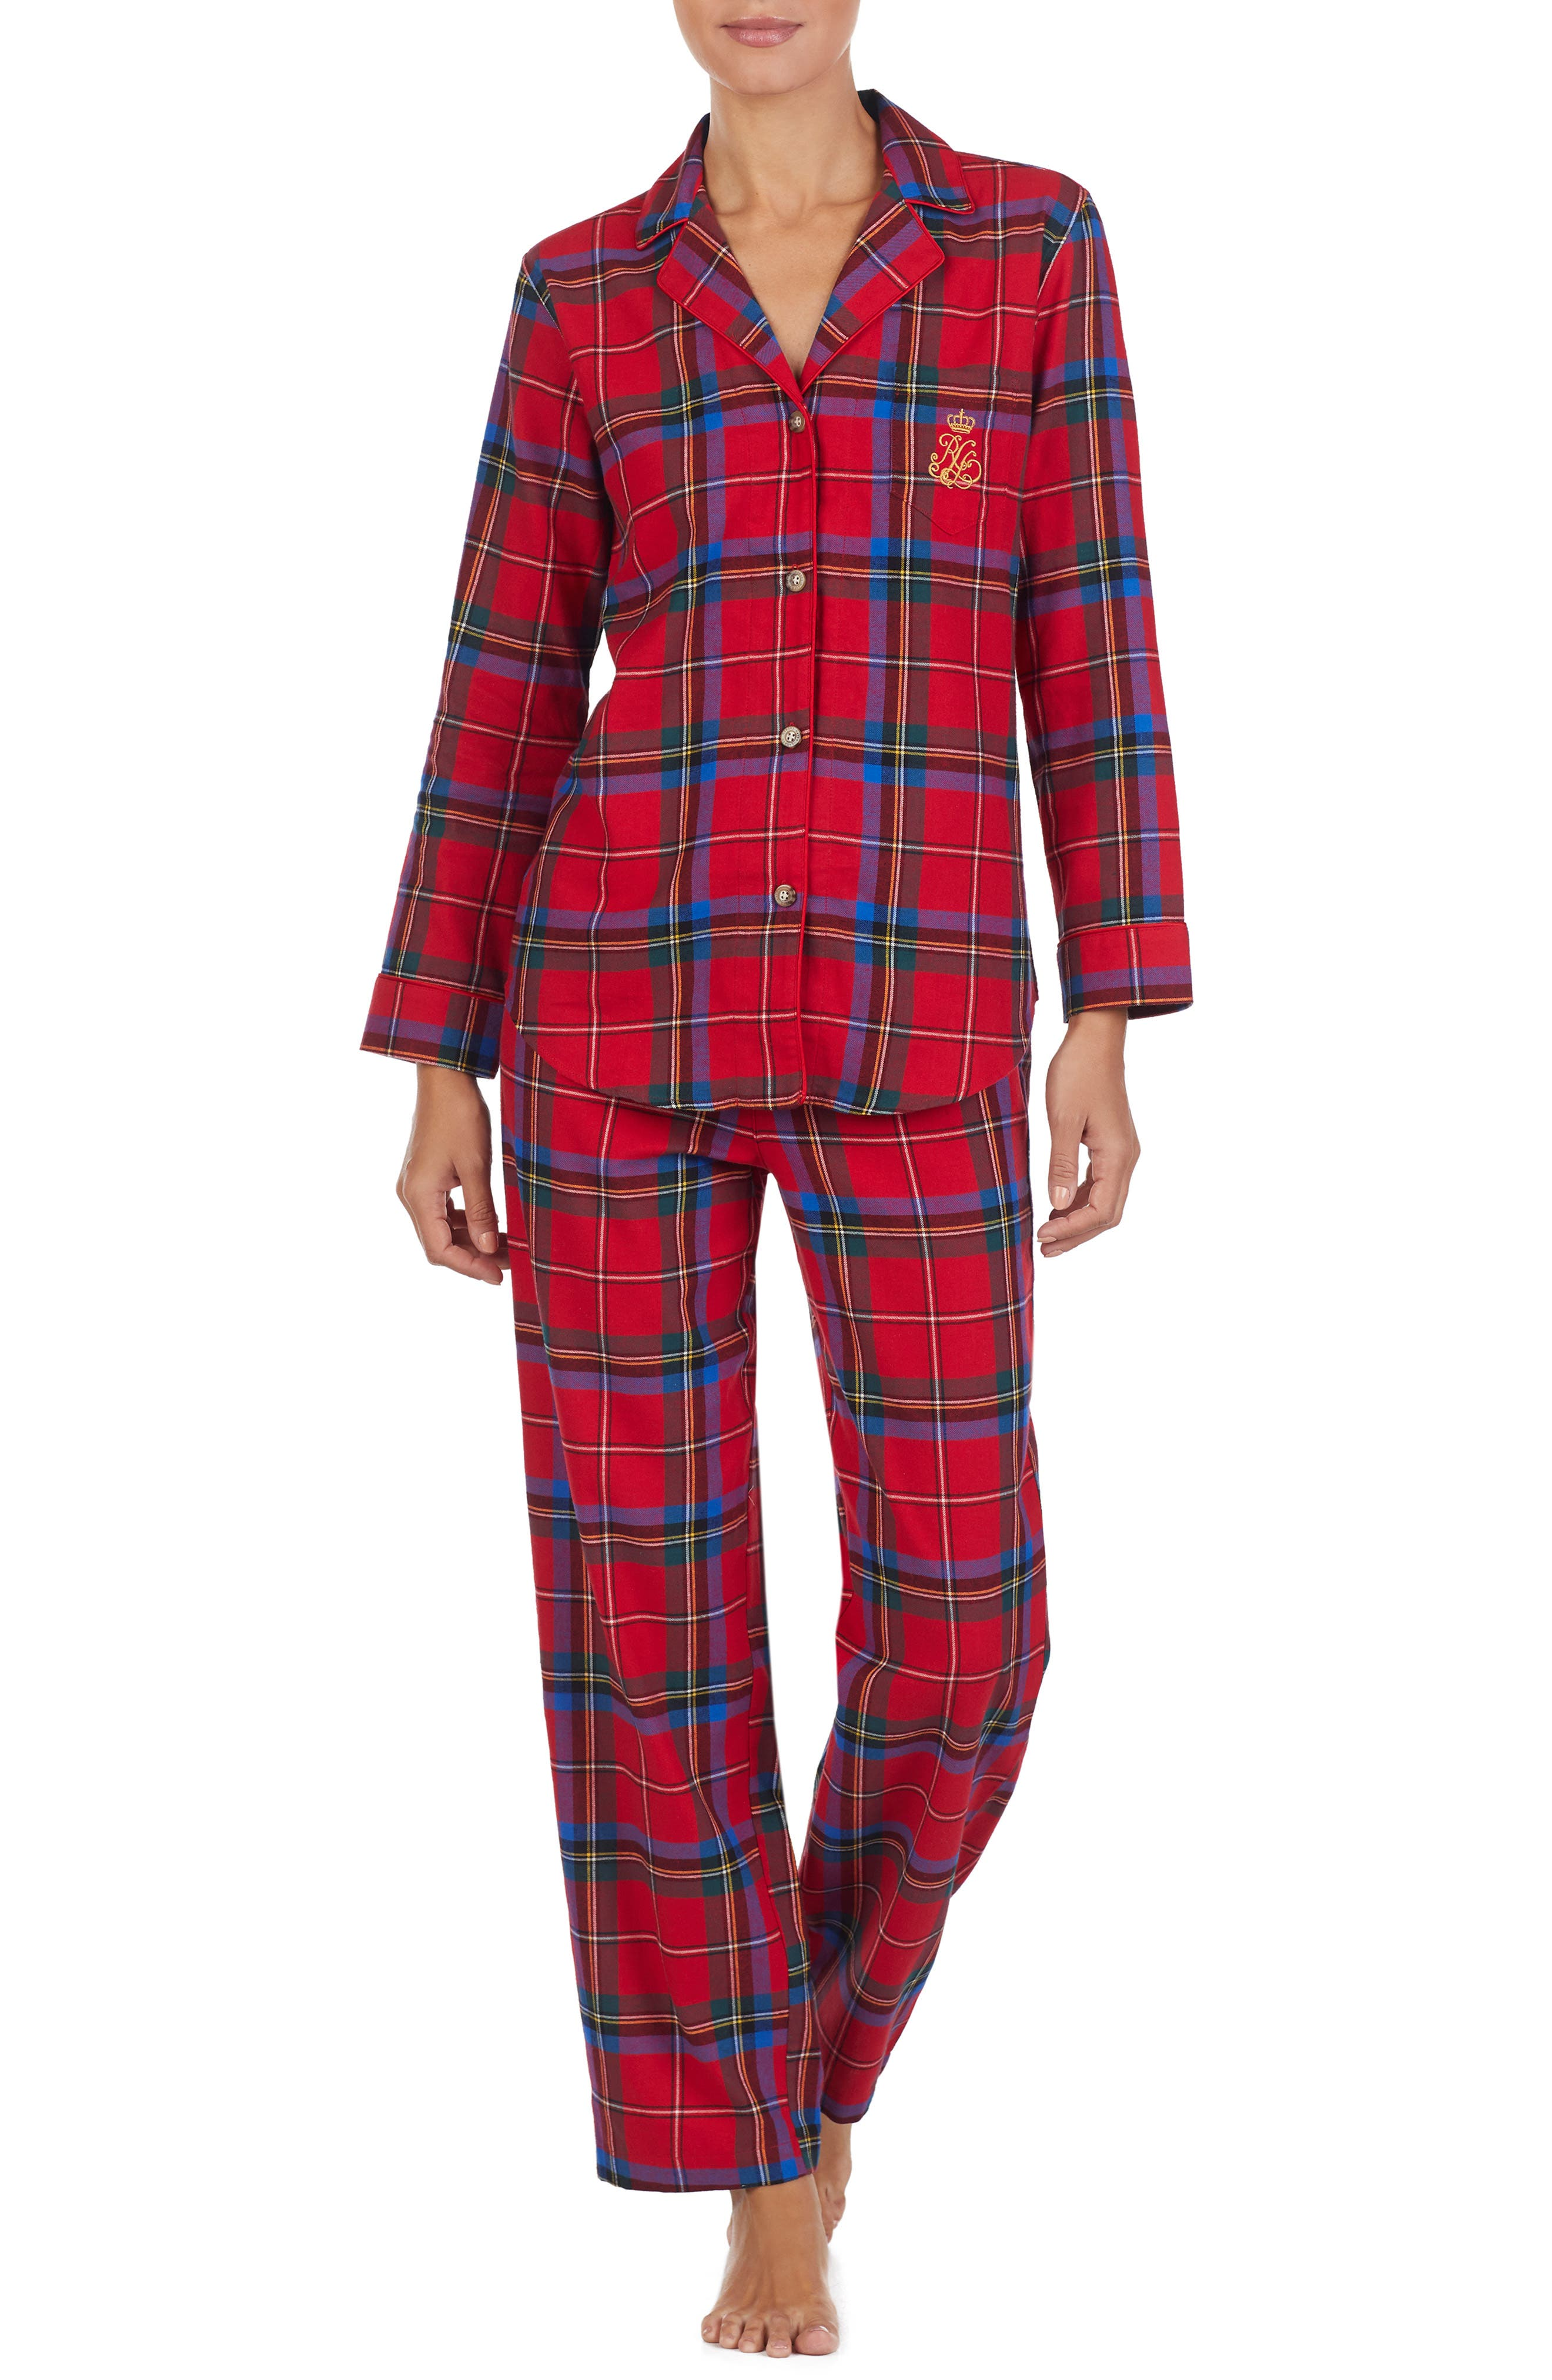 LAUREN RALPH LAUREN,                             Flannel Pajamas,                             Main thumbnail 1, color,                             644